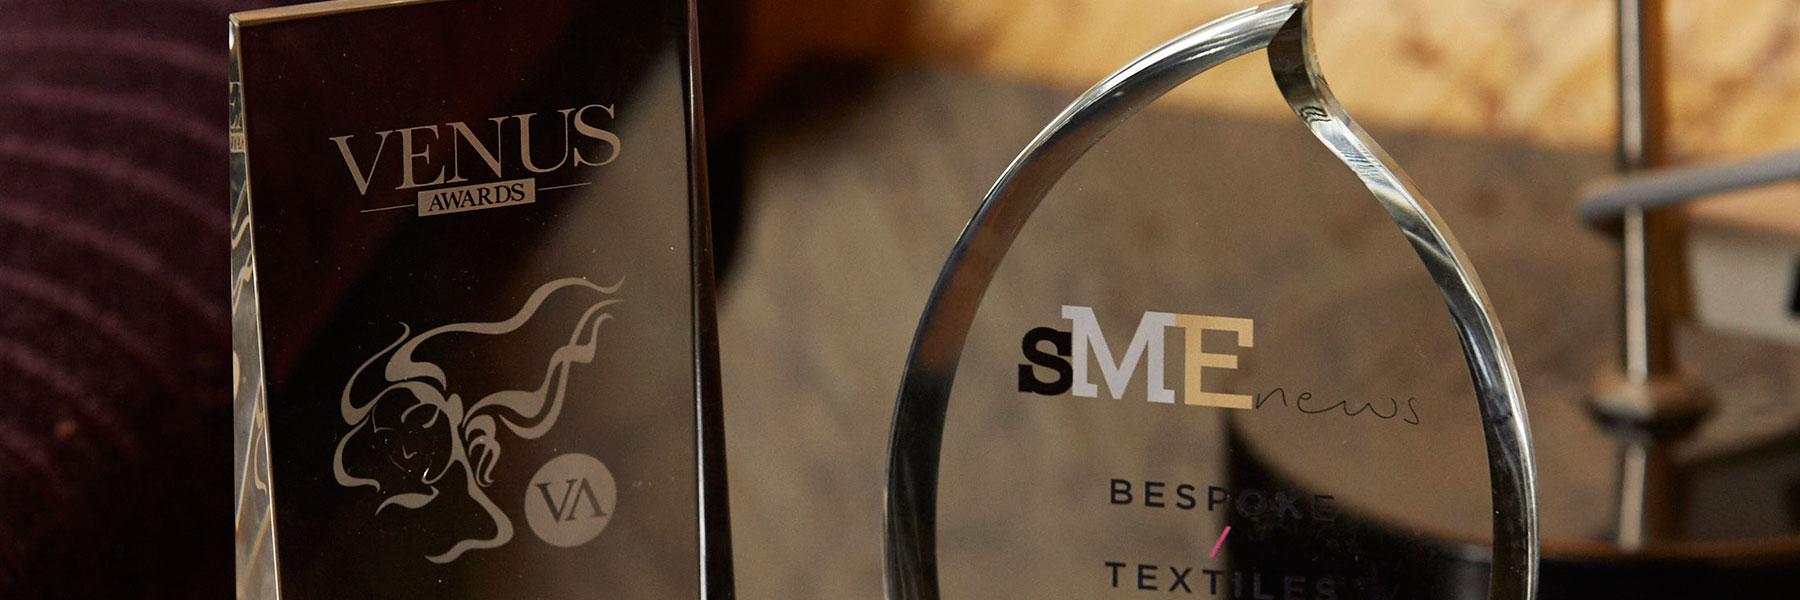 Bespoke Textiles awards